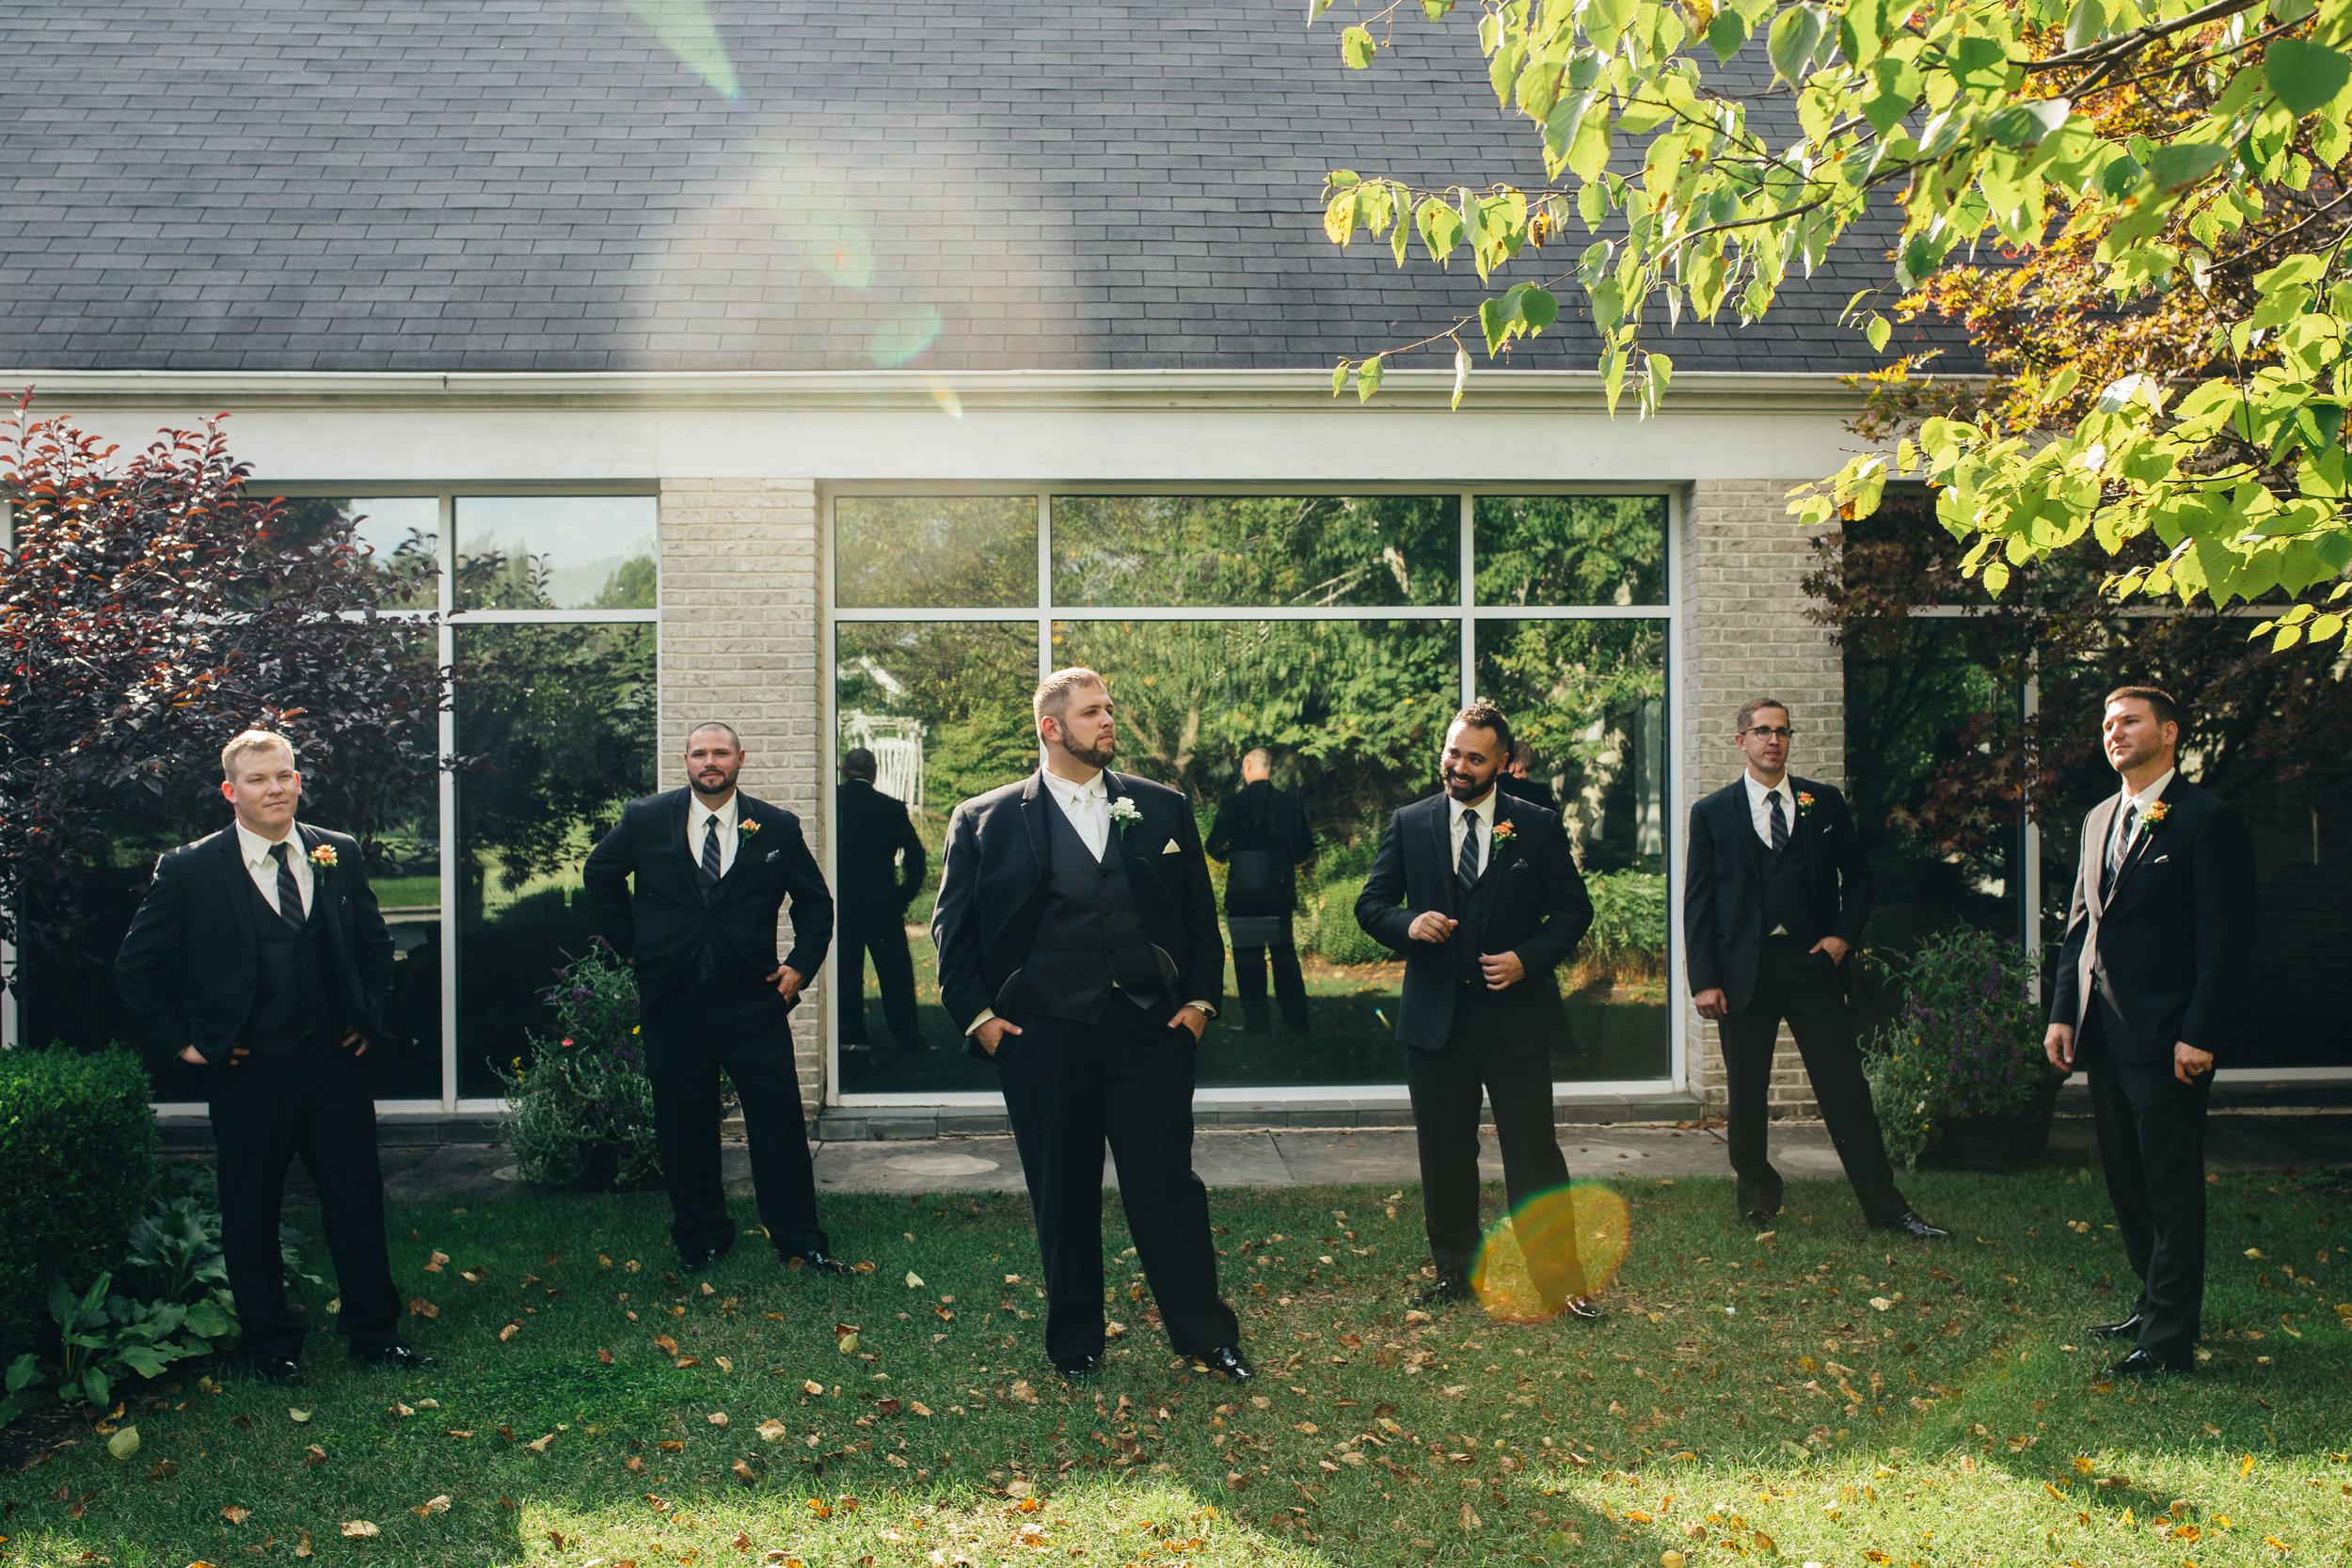 Groomsmen photography at Walden Inn & Spa.